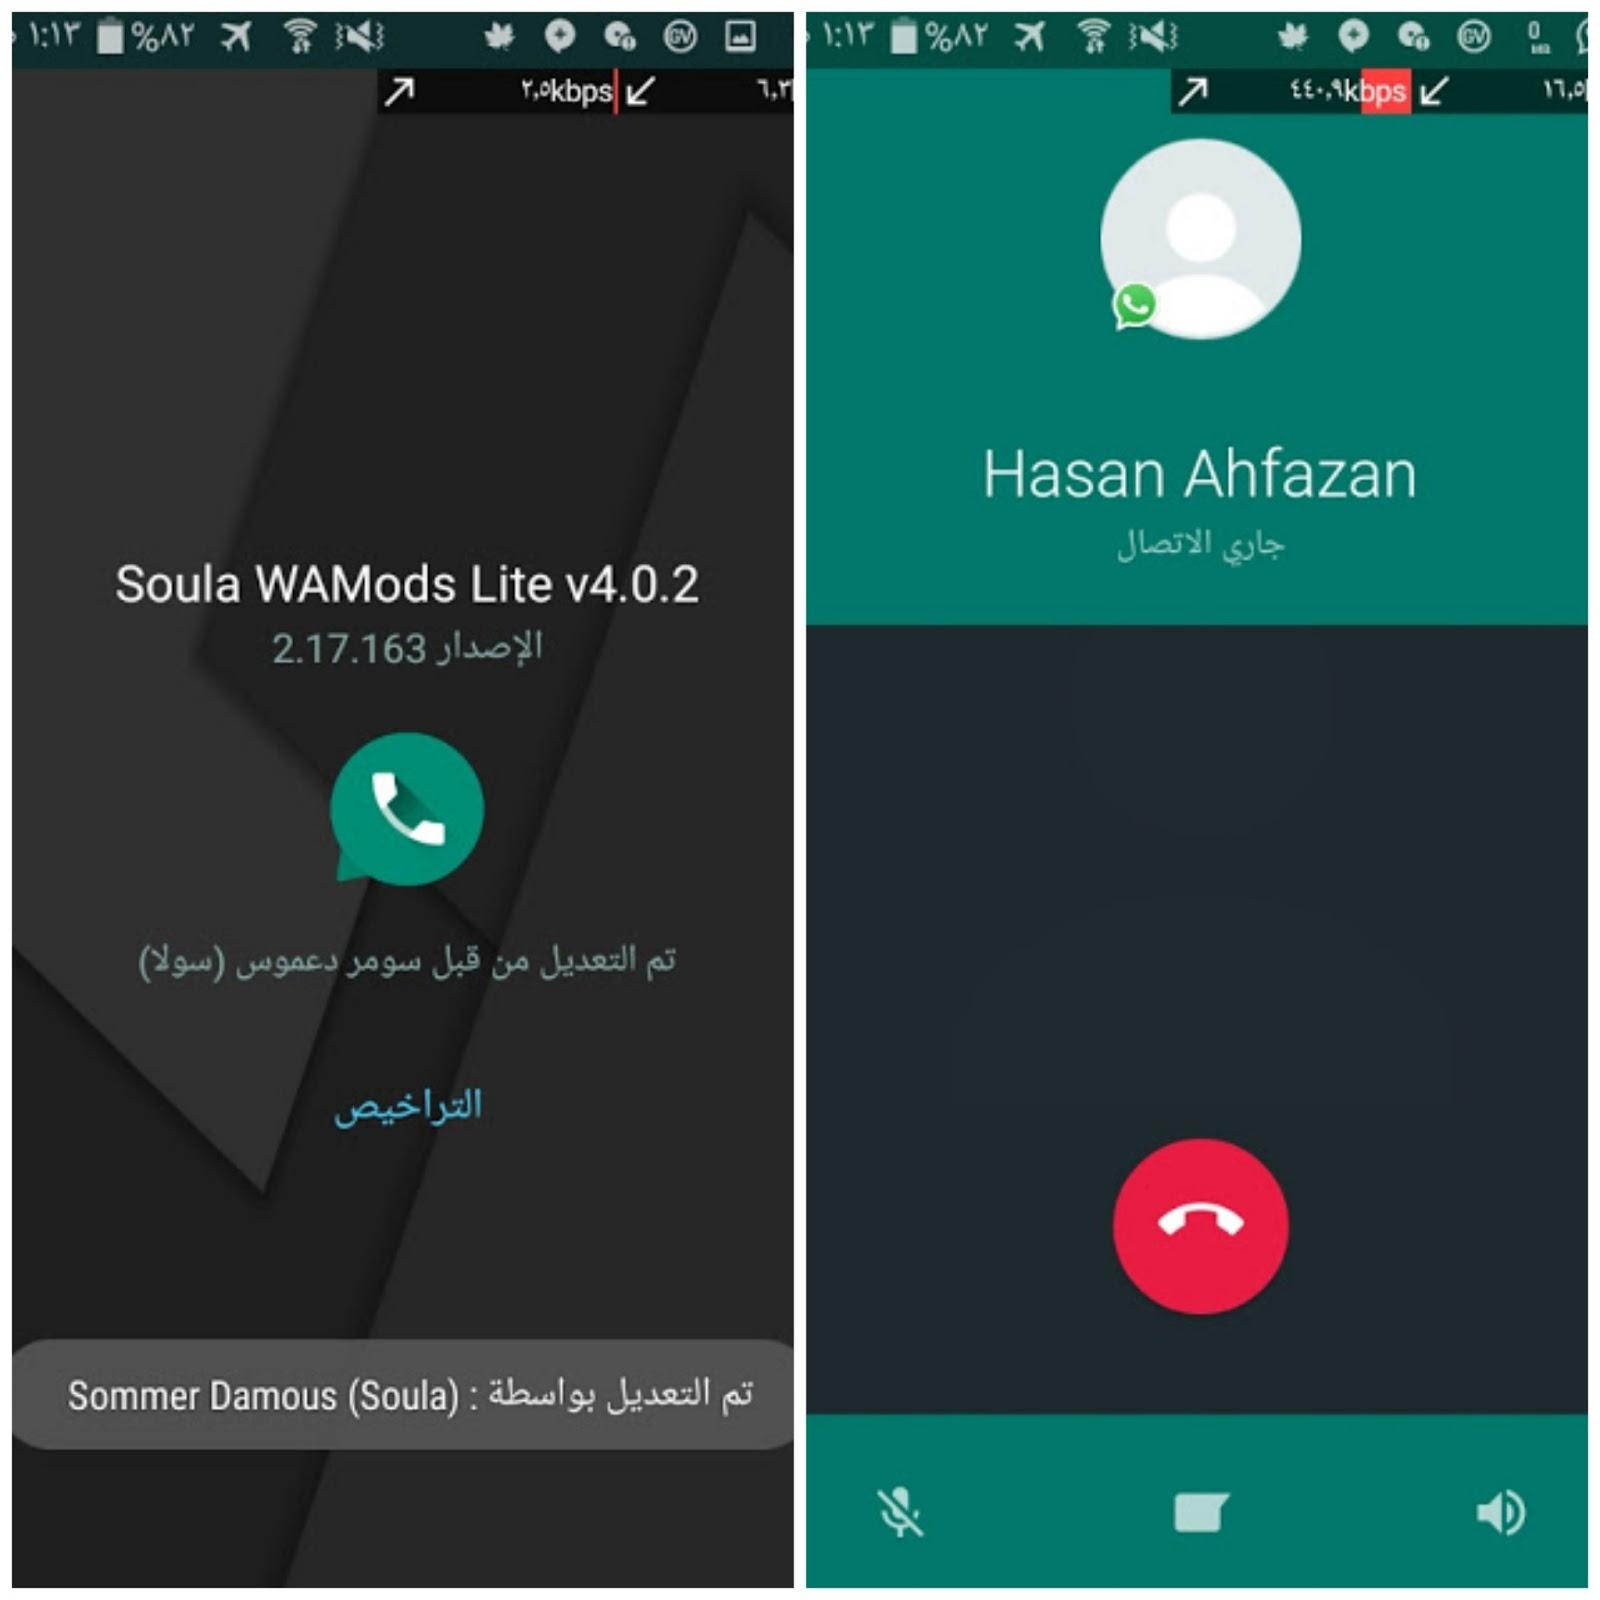 Soula WhatsApp Lite v4 0 2 Latest Version Download Now